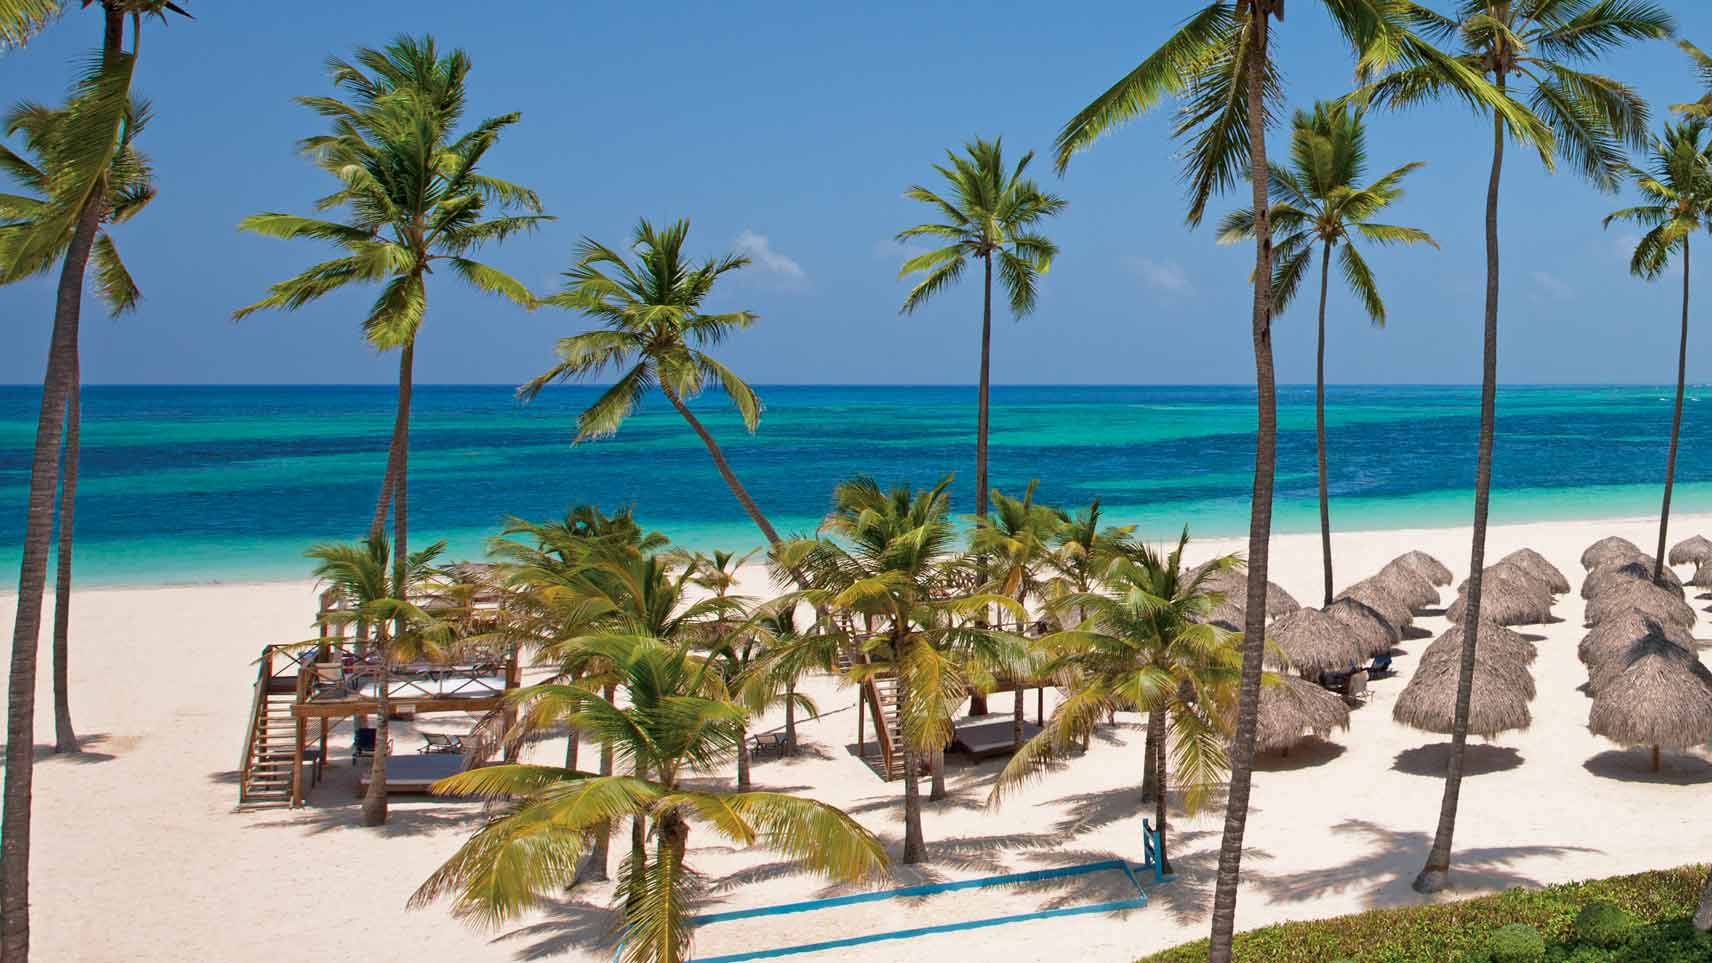 Cheap Caribbean Vacations